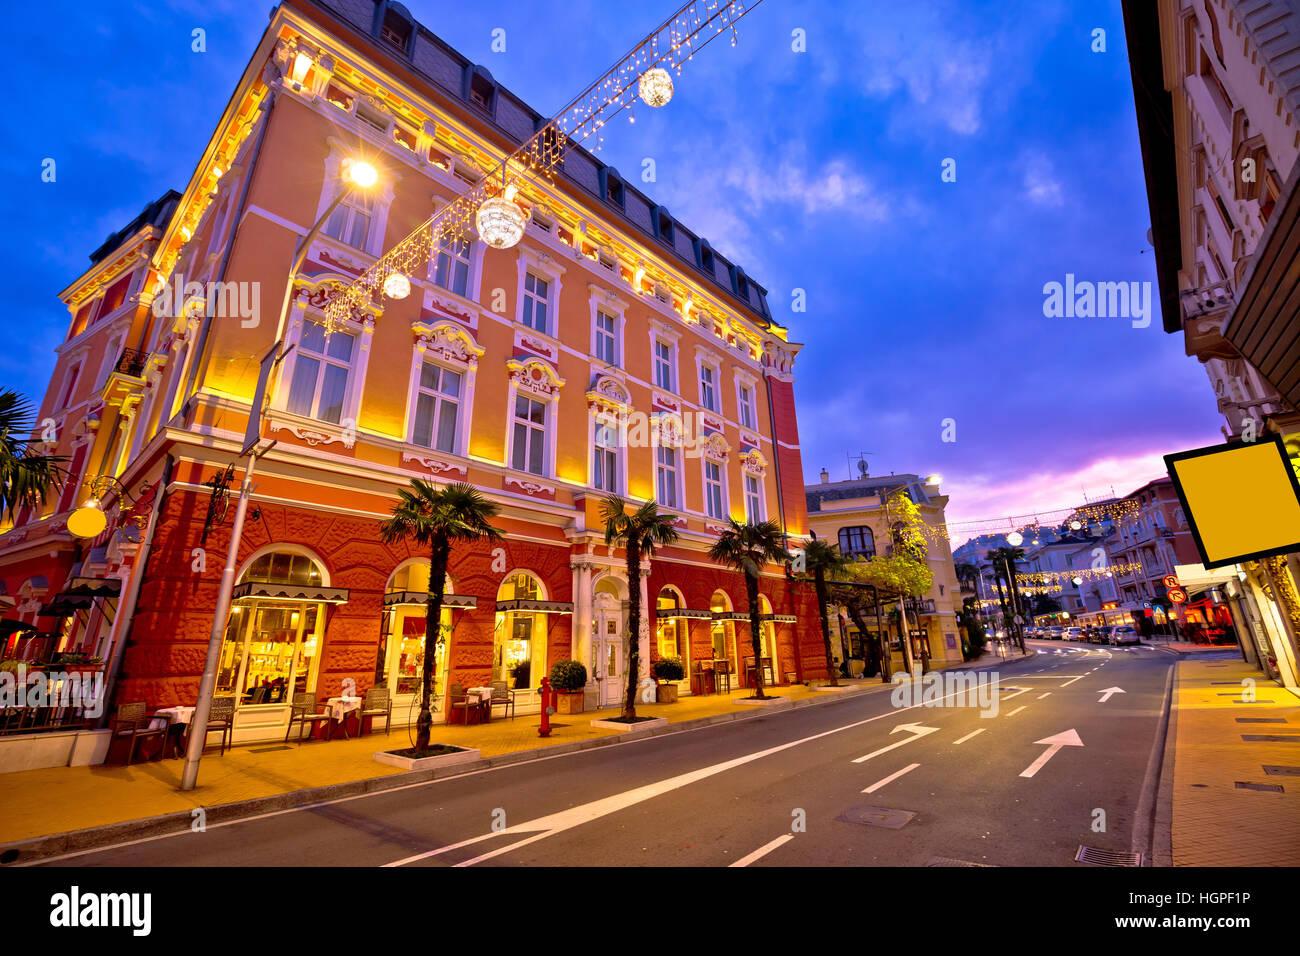 Town of Opatija evening streetscape, classic architecture of Kvarner, Croatia - Stock Image